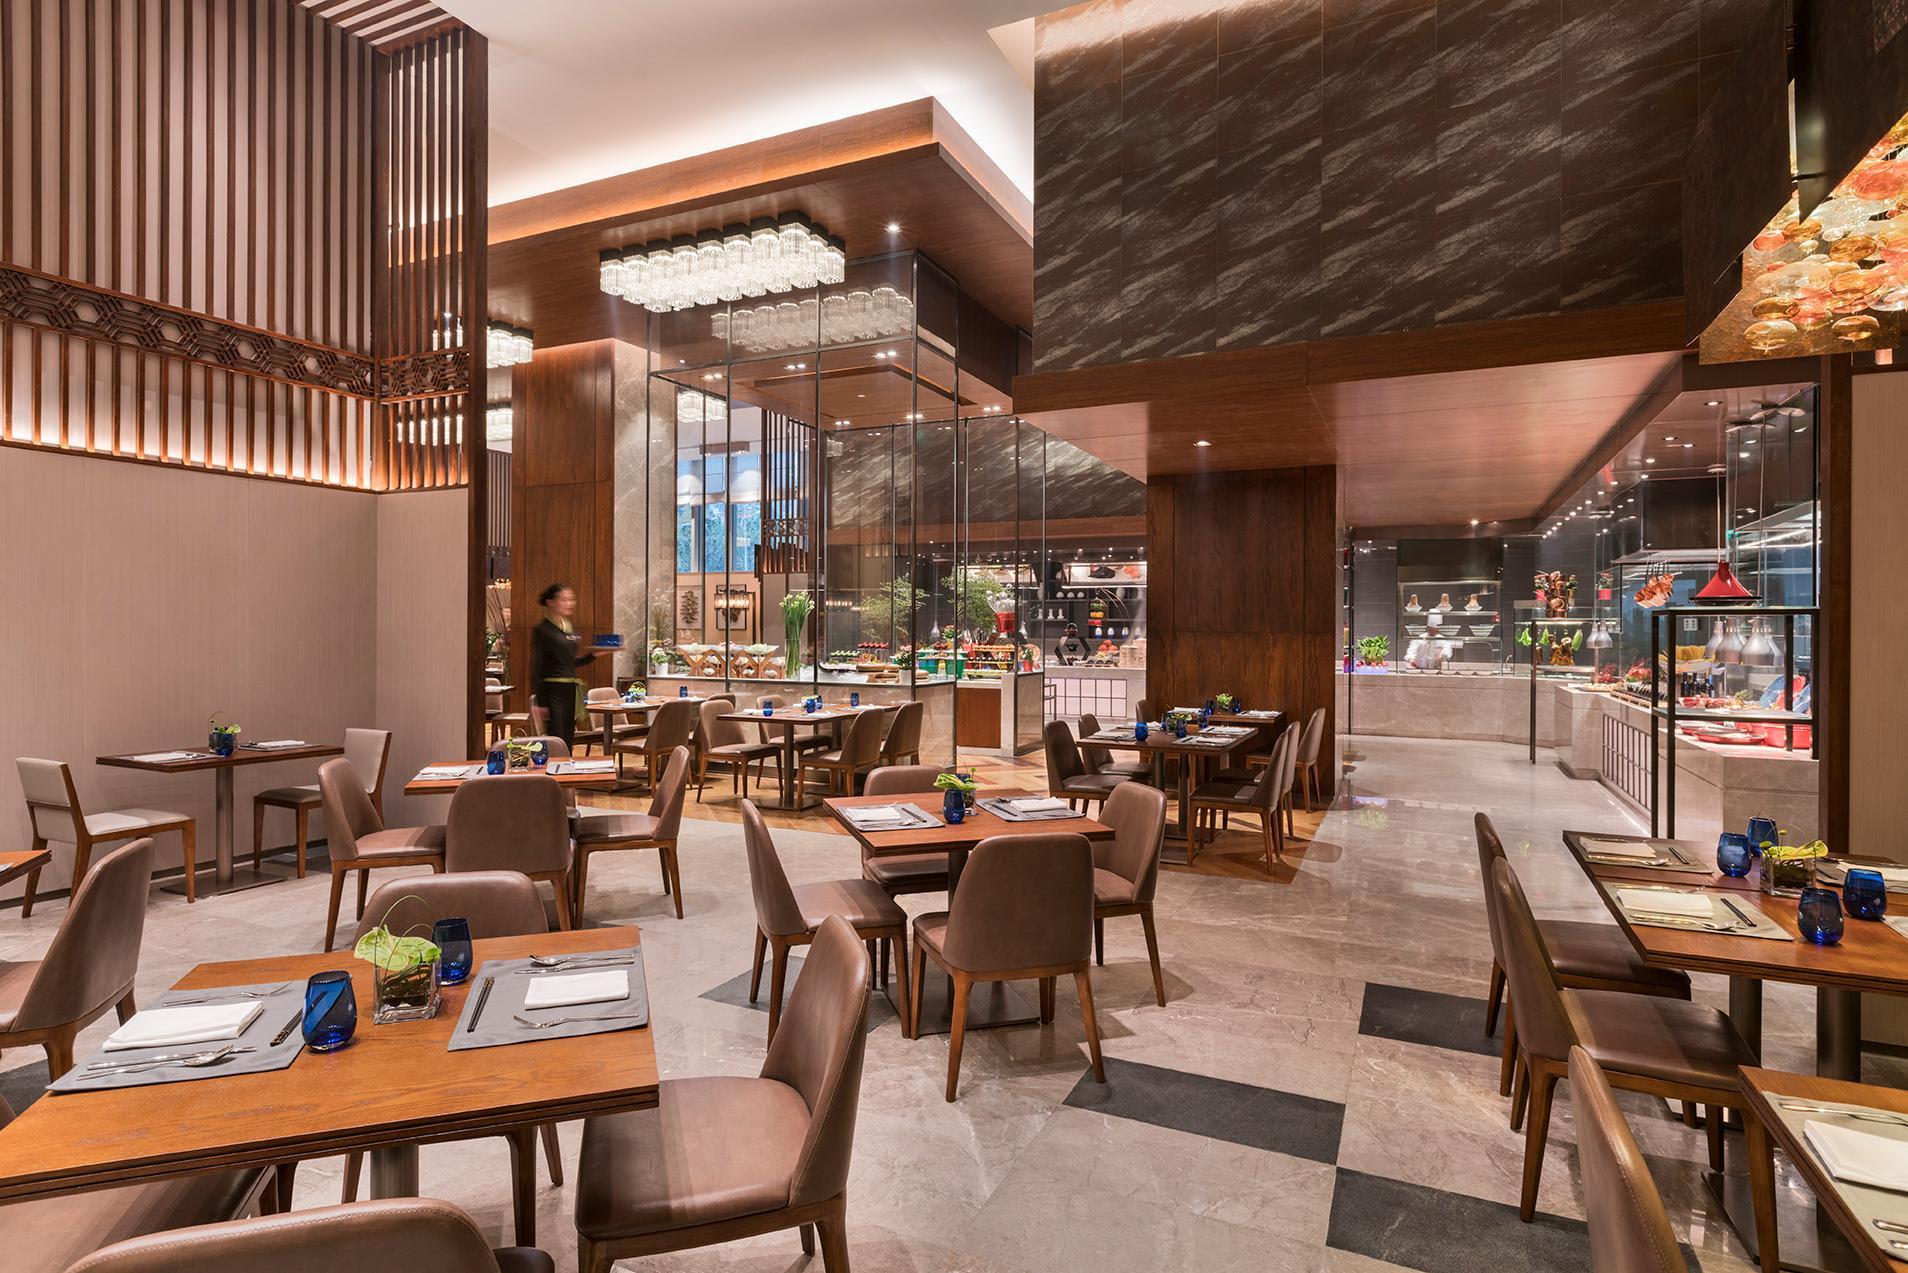 Price DoubleTree by Hilton Hotel Shiyan